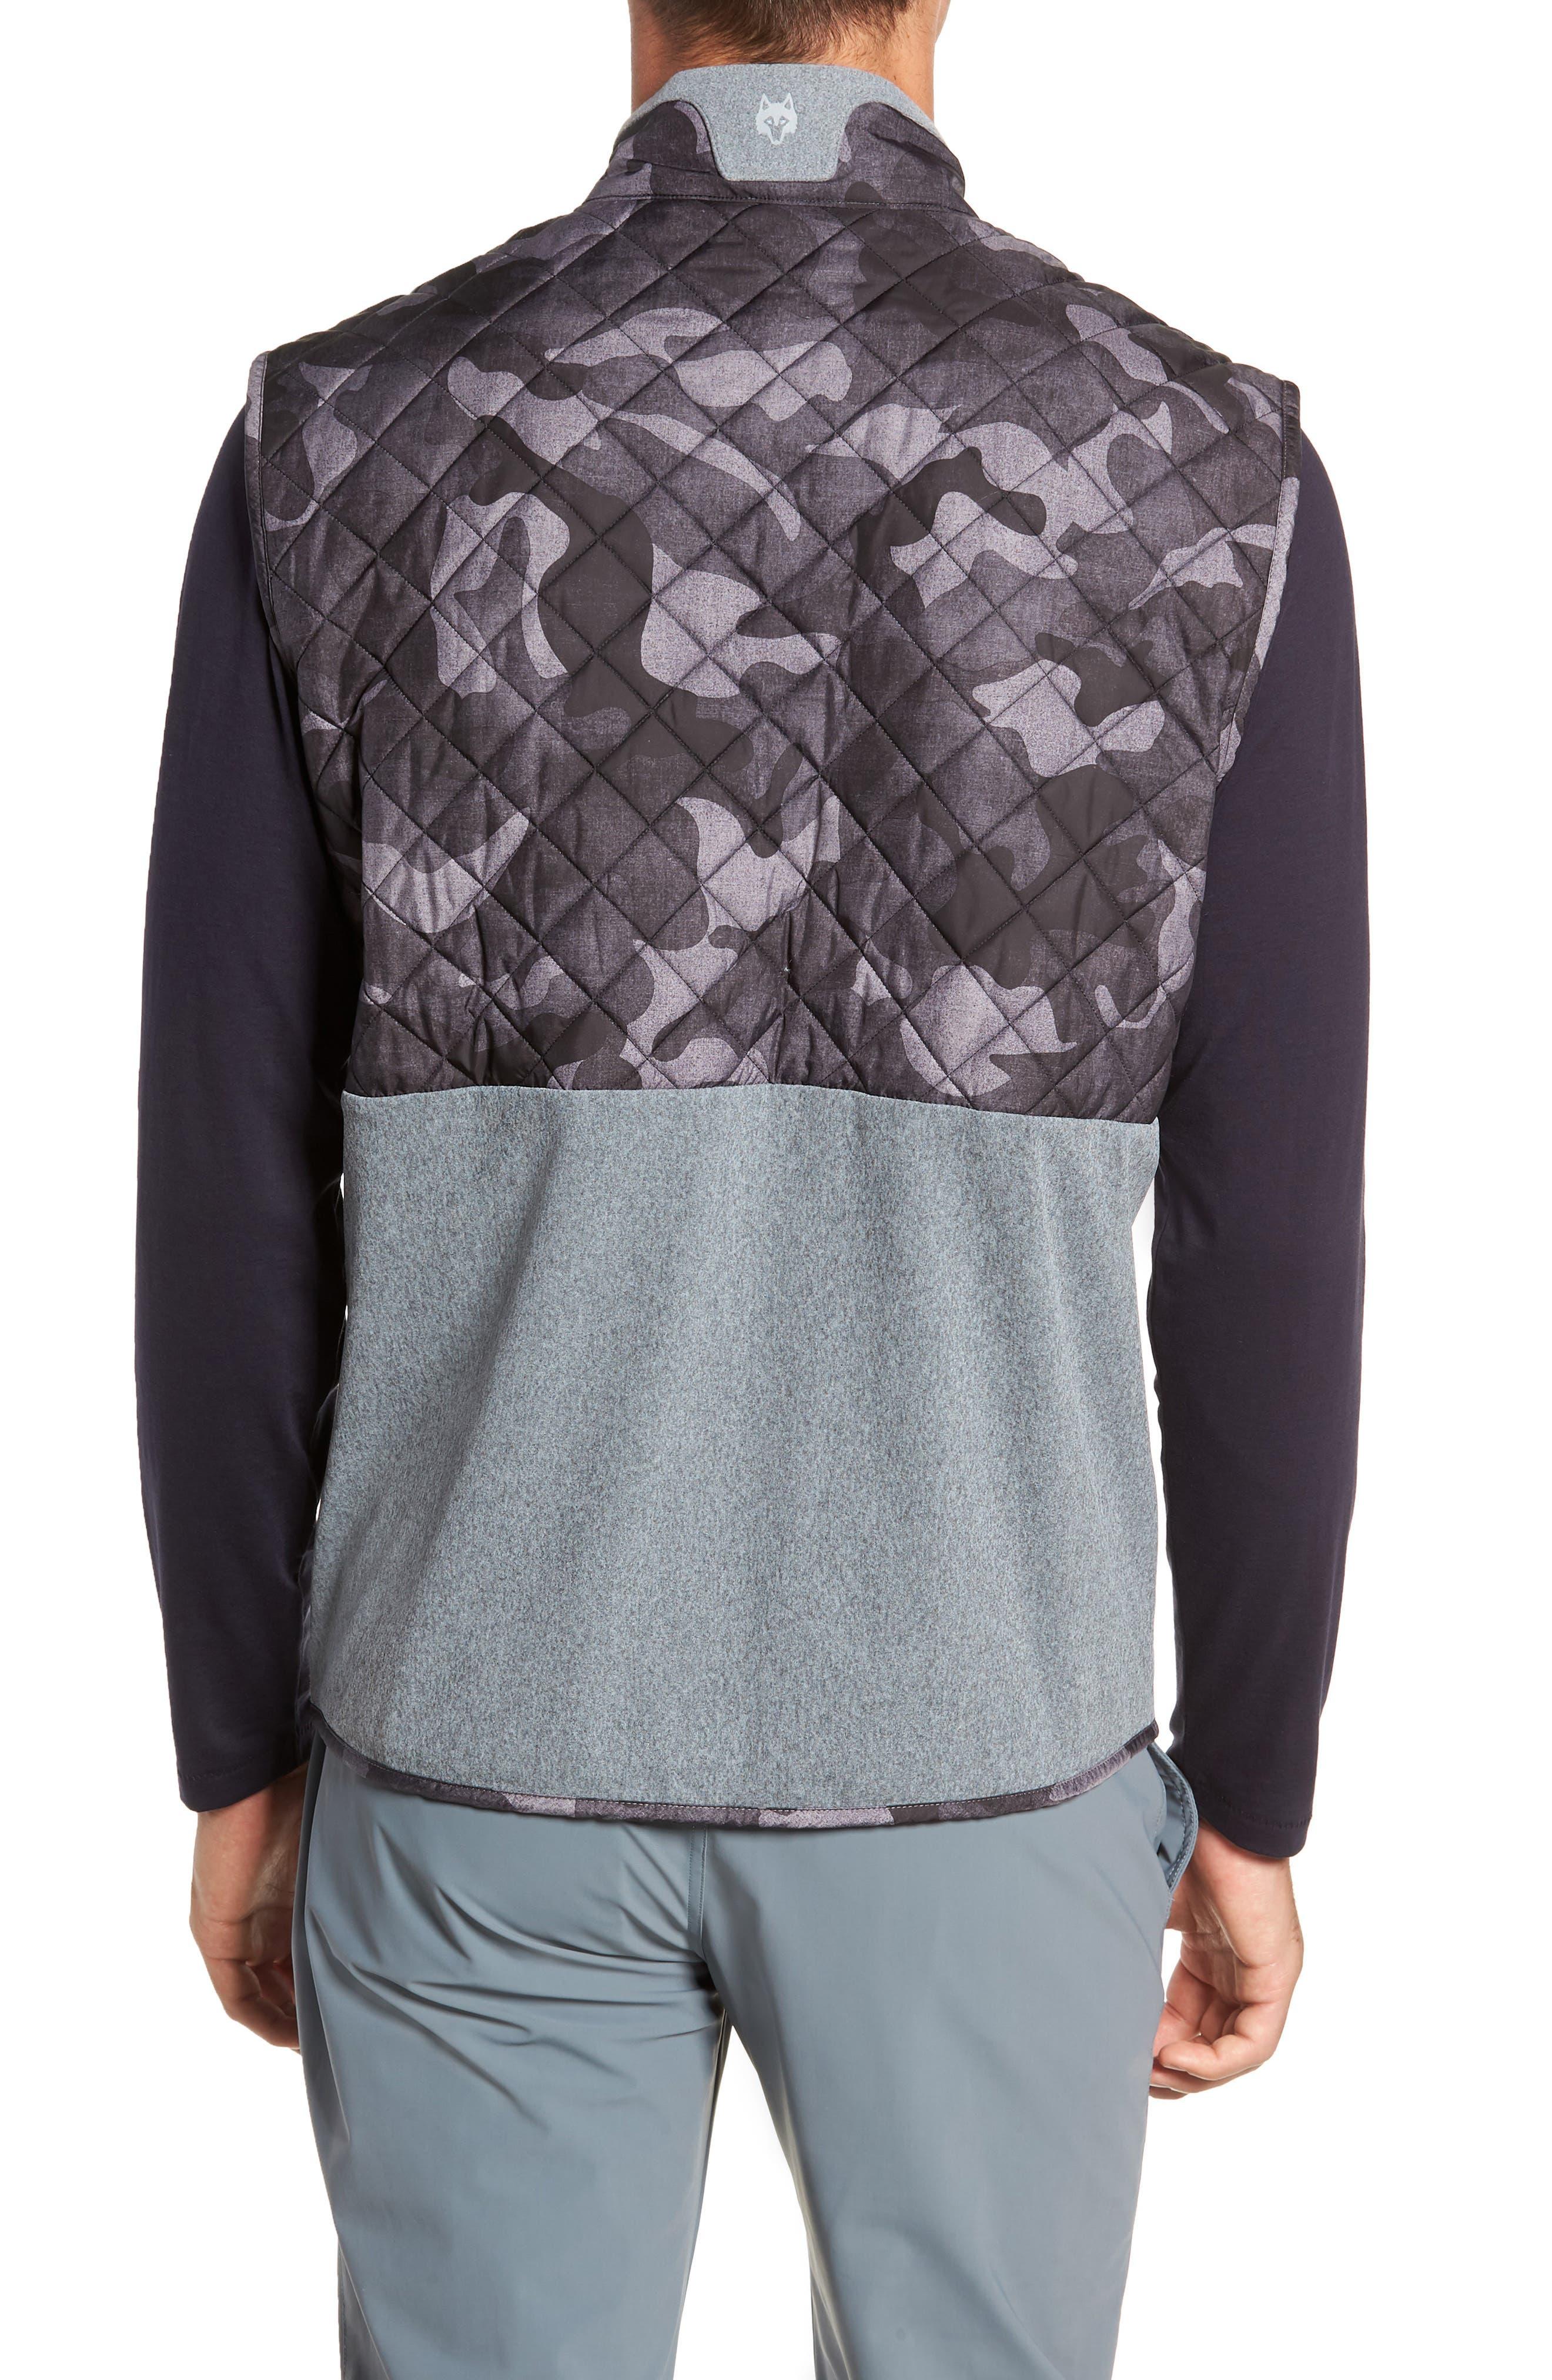 Huron Hybrid Vest,                             Alternate thumbnail 2, color,                             GREY HEATHER/ GREY CAMO